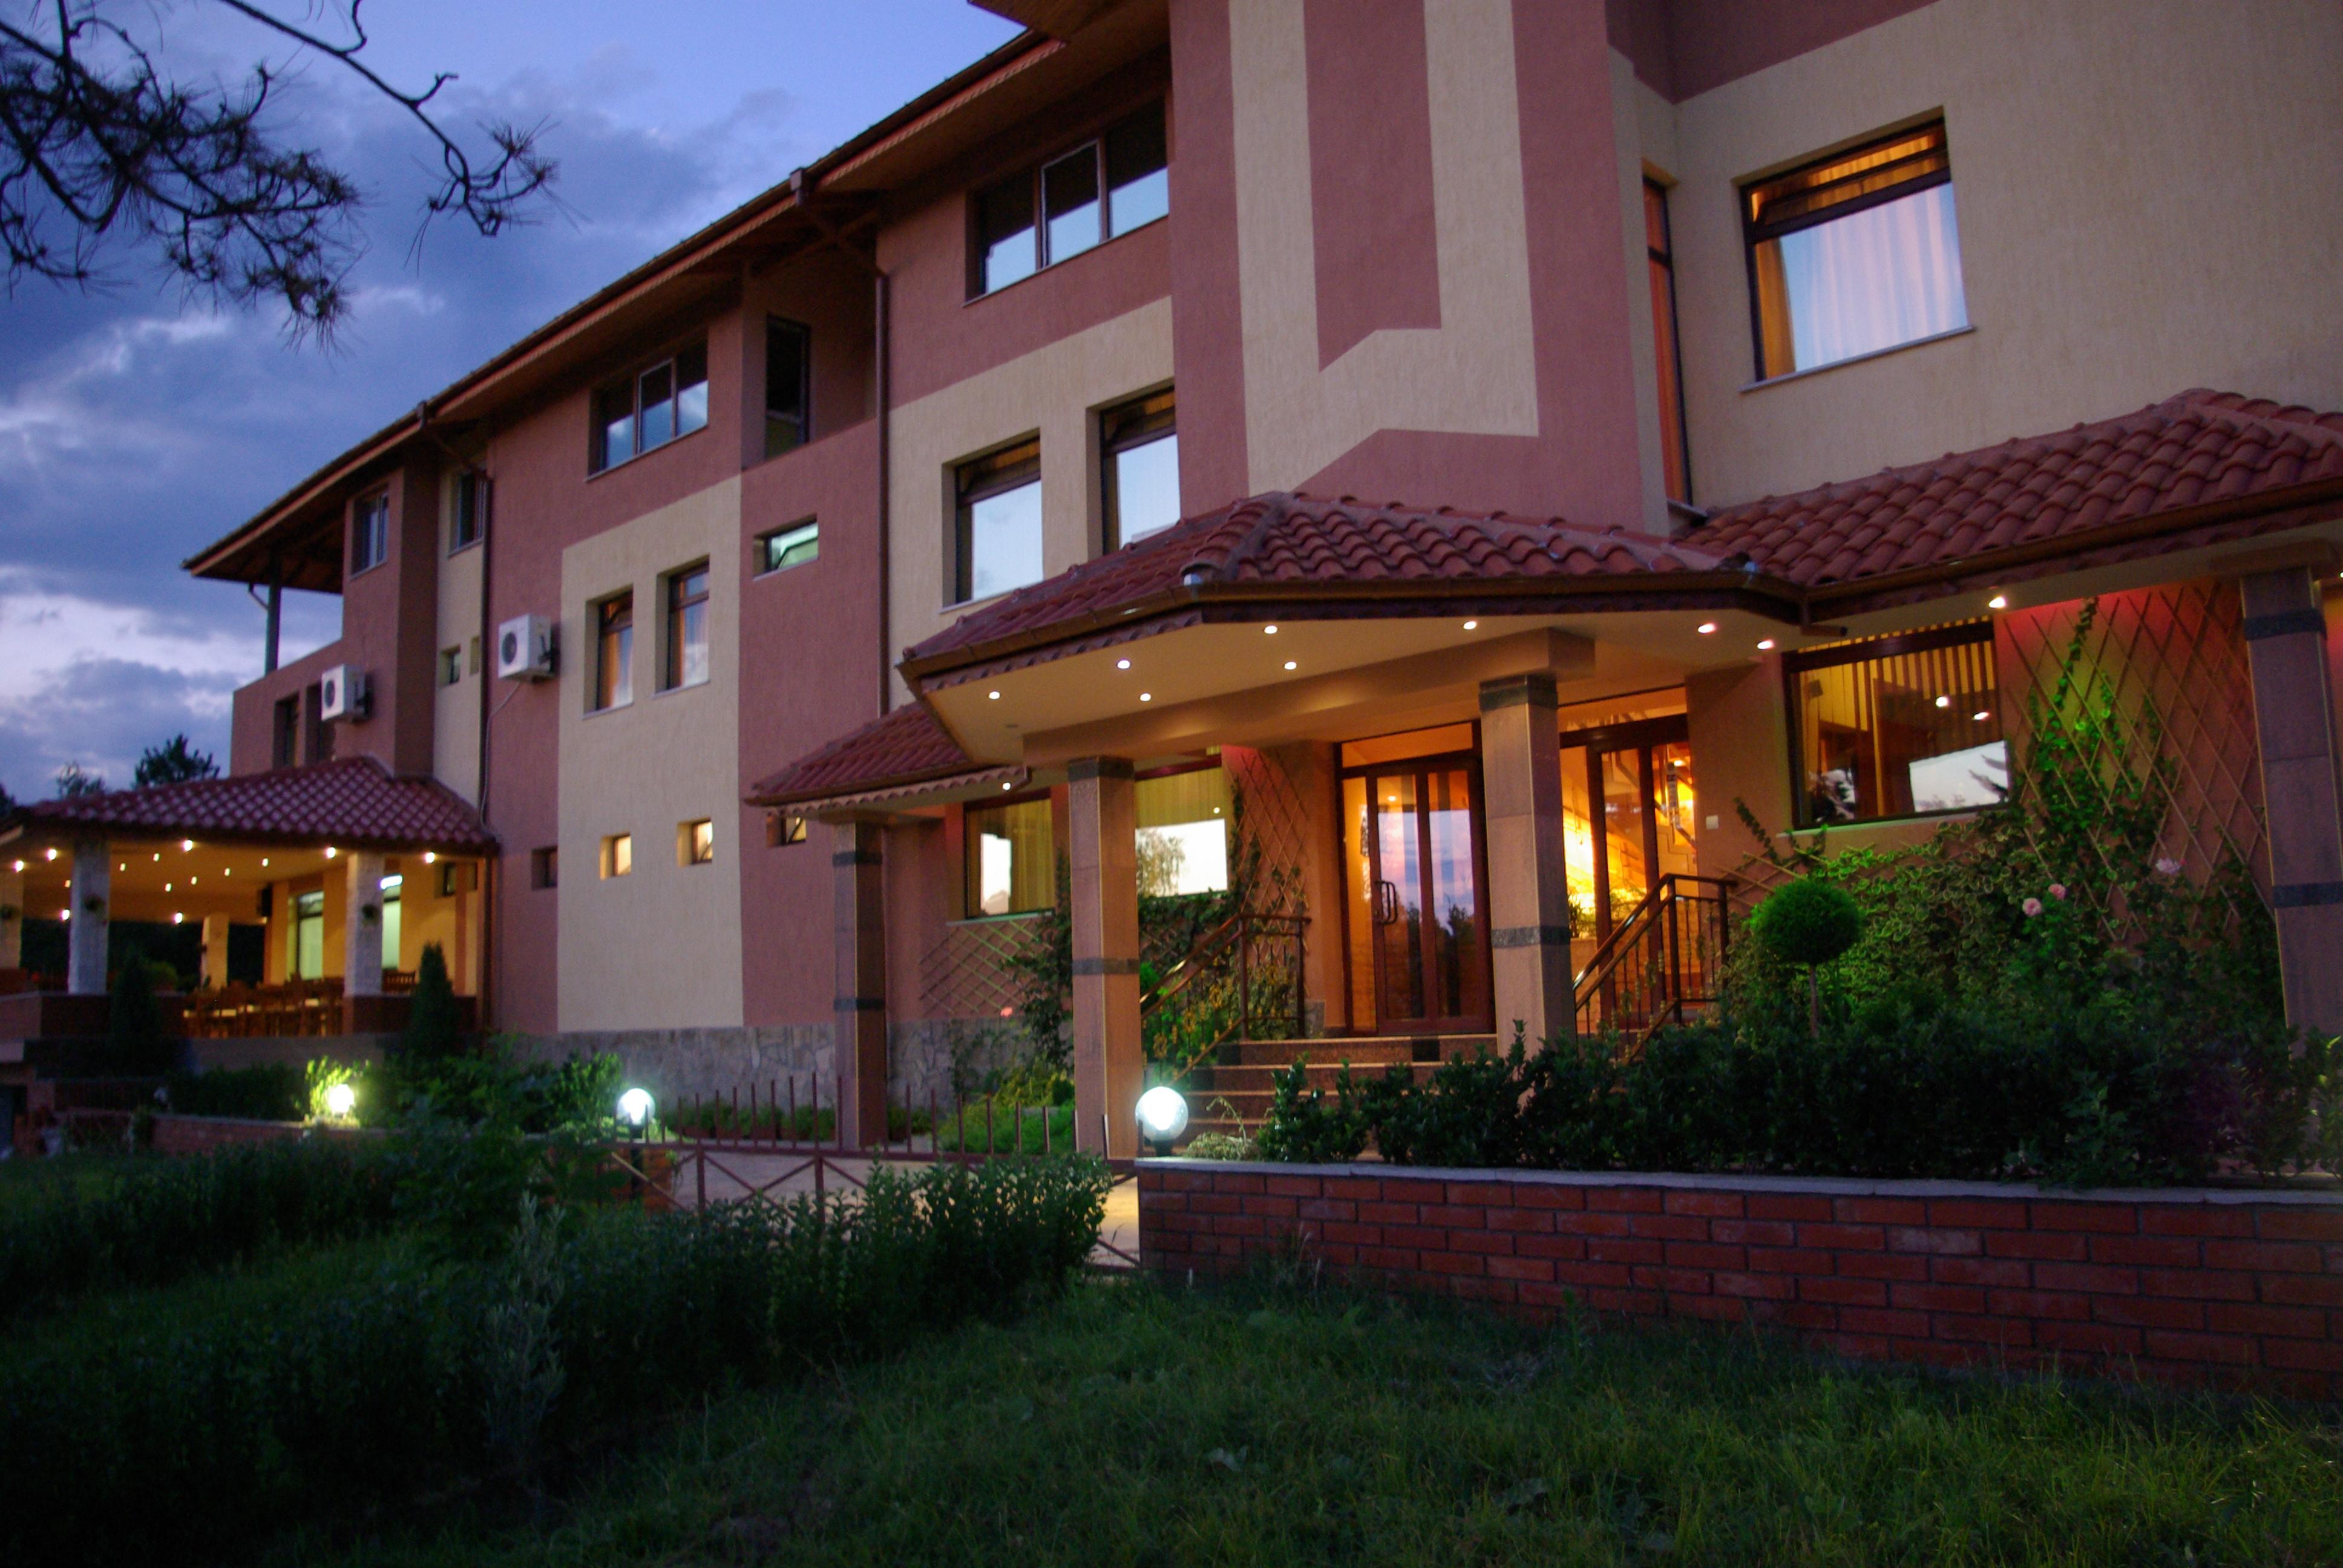 Хотелски комлекс Конак Момчилград